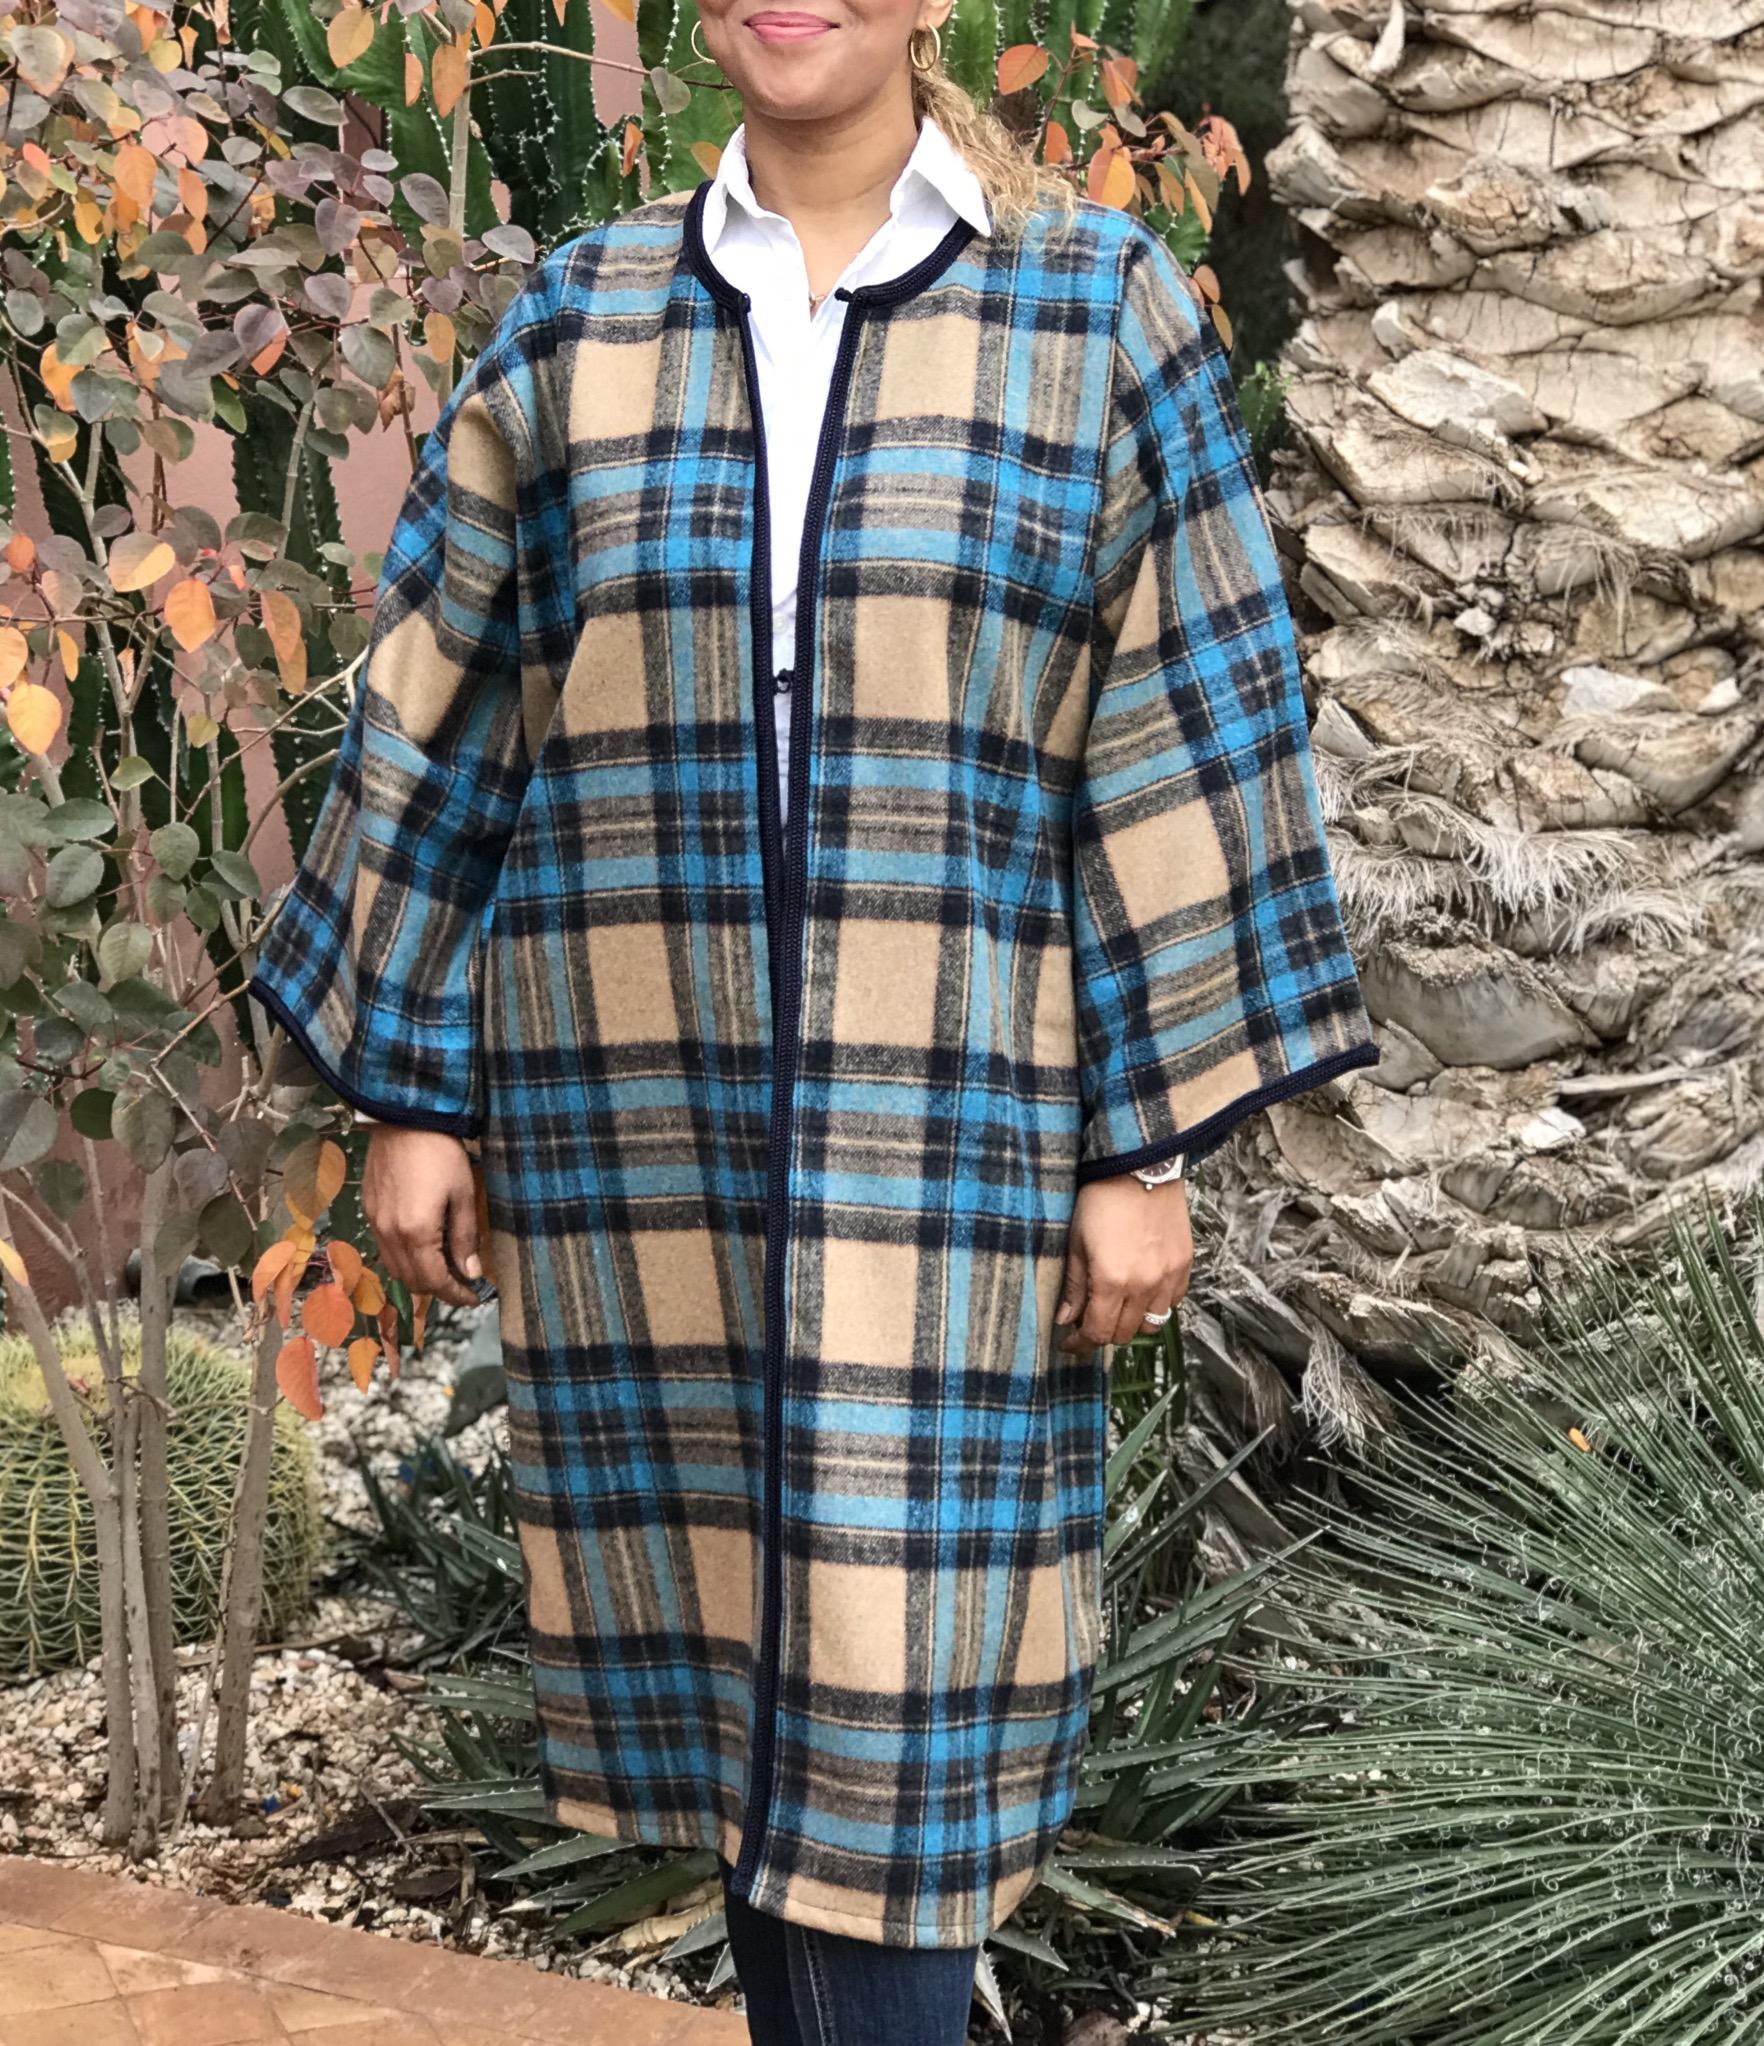 Coat tweed tiles beige turquoise with Sfifa & aqadi blue